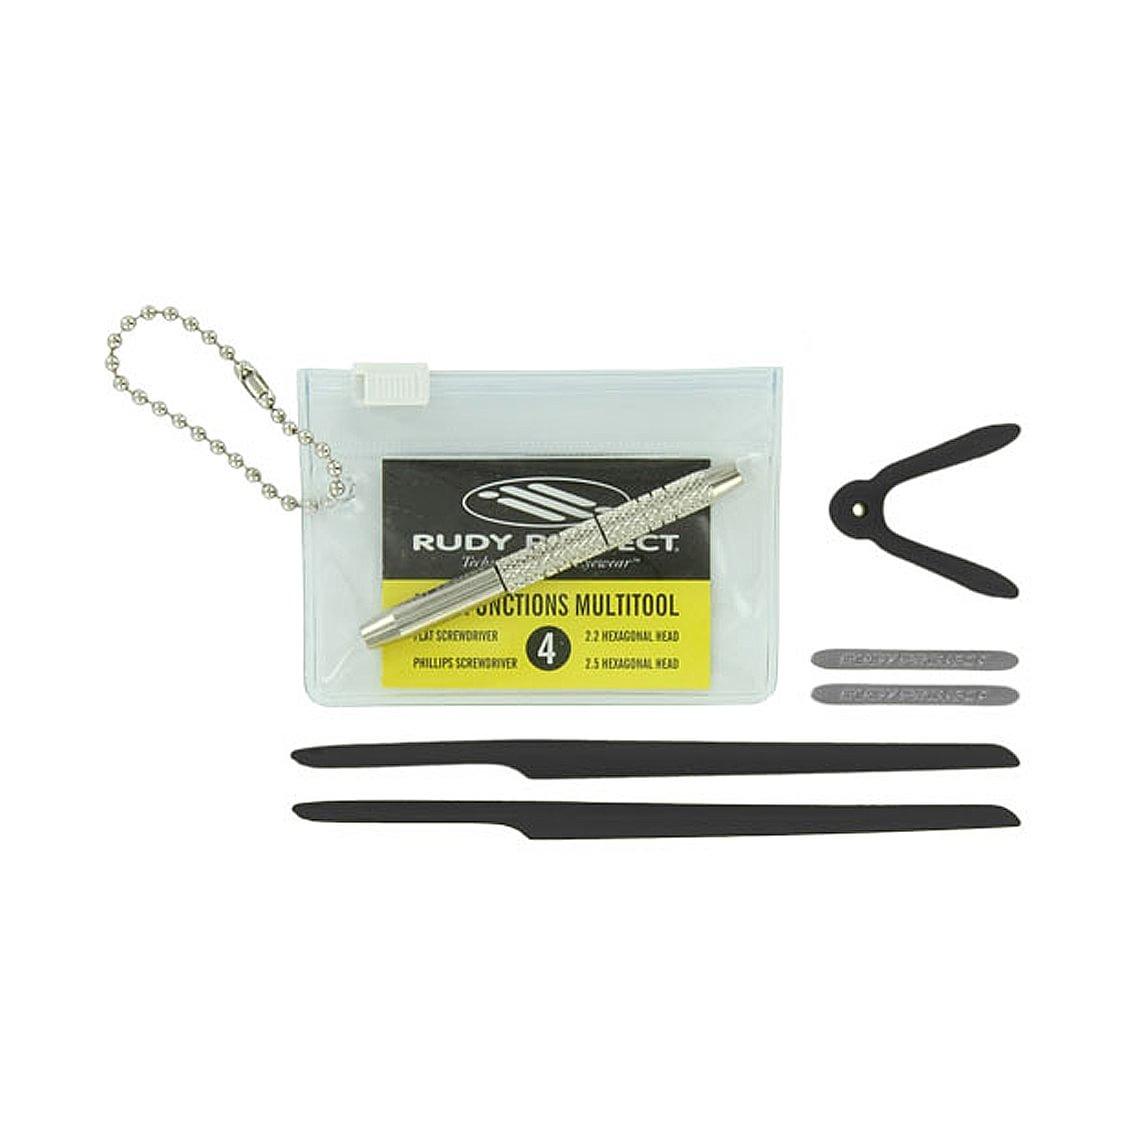 Rudy Project Rydon Chromatic kit black